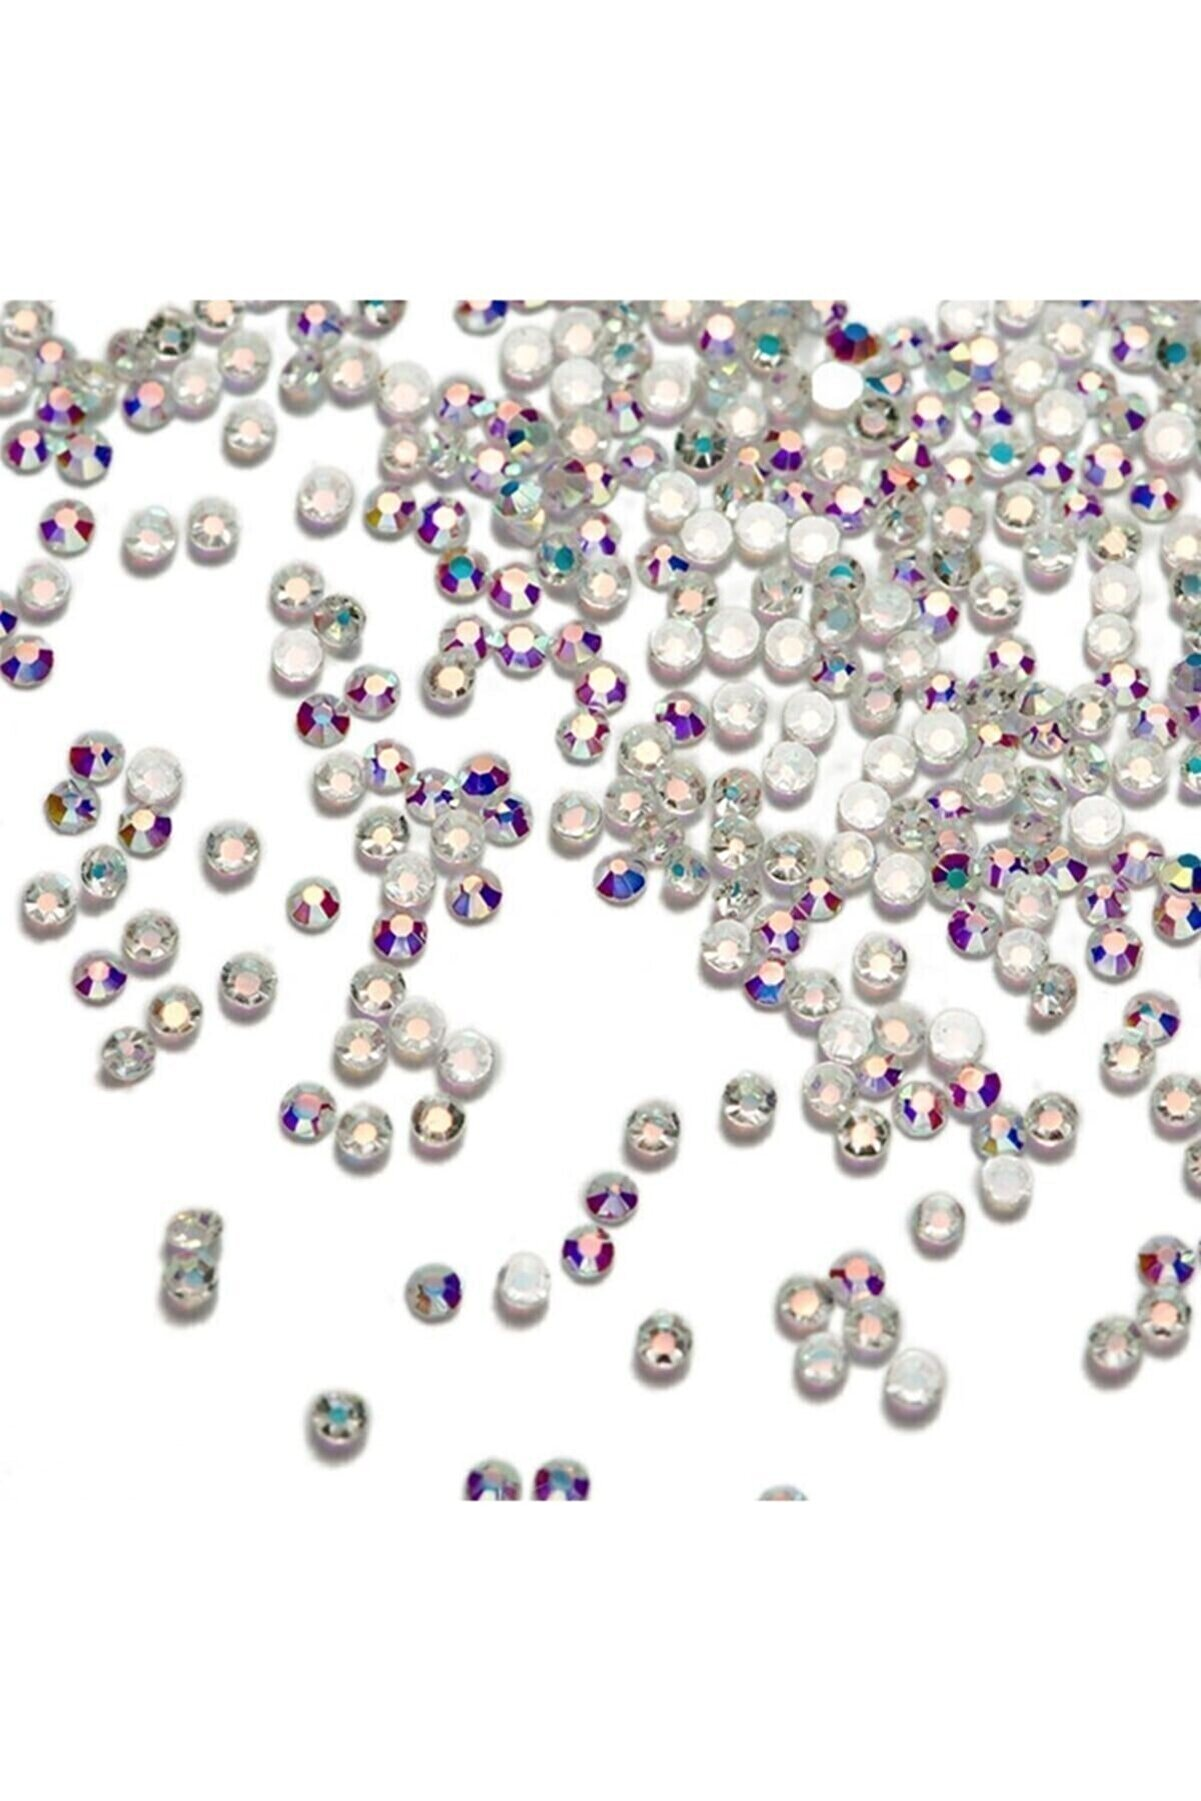 tnl shop Kadın   Professional Kristal Taş Beyaz 50 Adet No 5